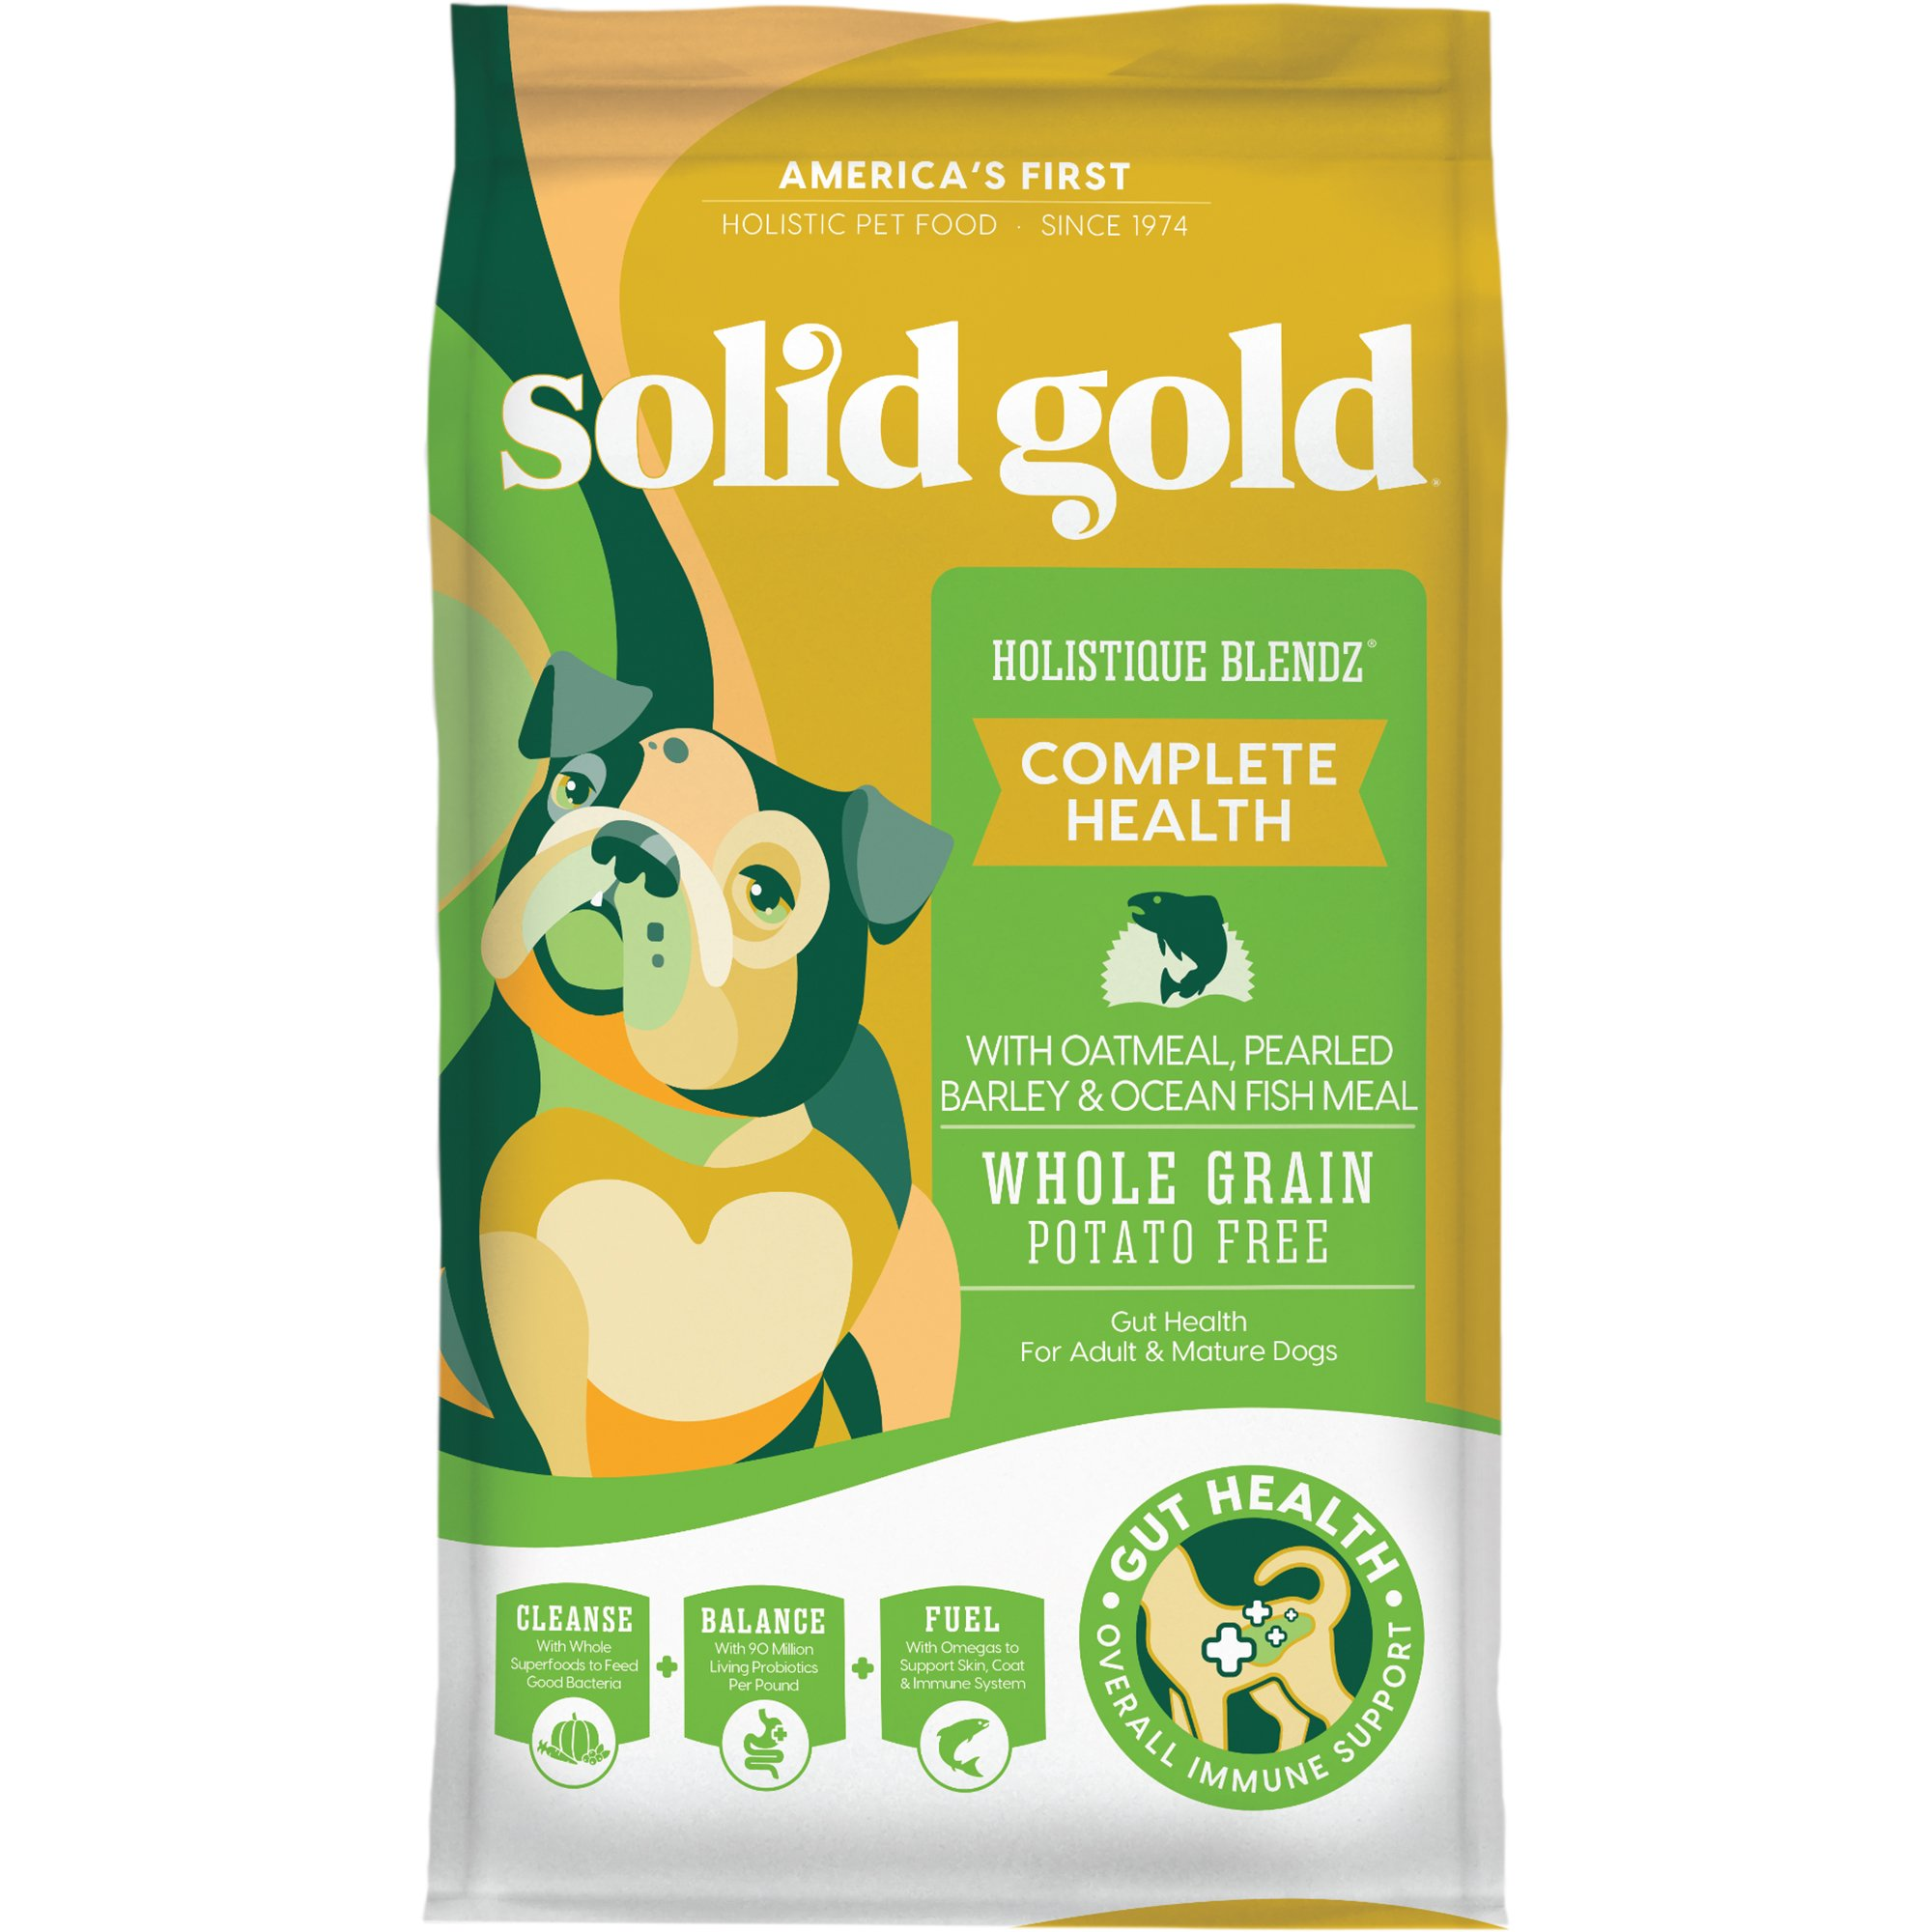 Solid gold holistique blendz oatmeal pearled barley for Solid gold fish